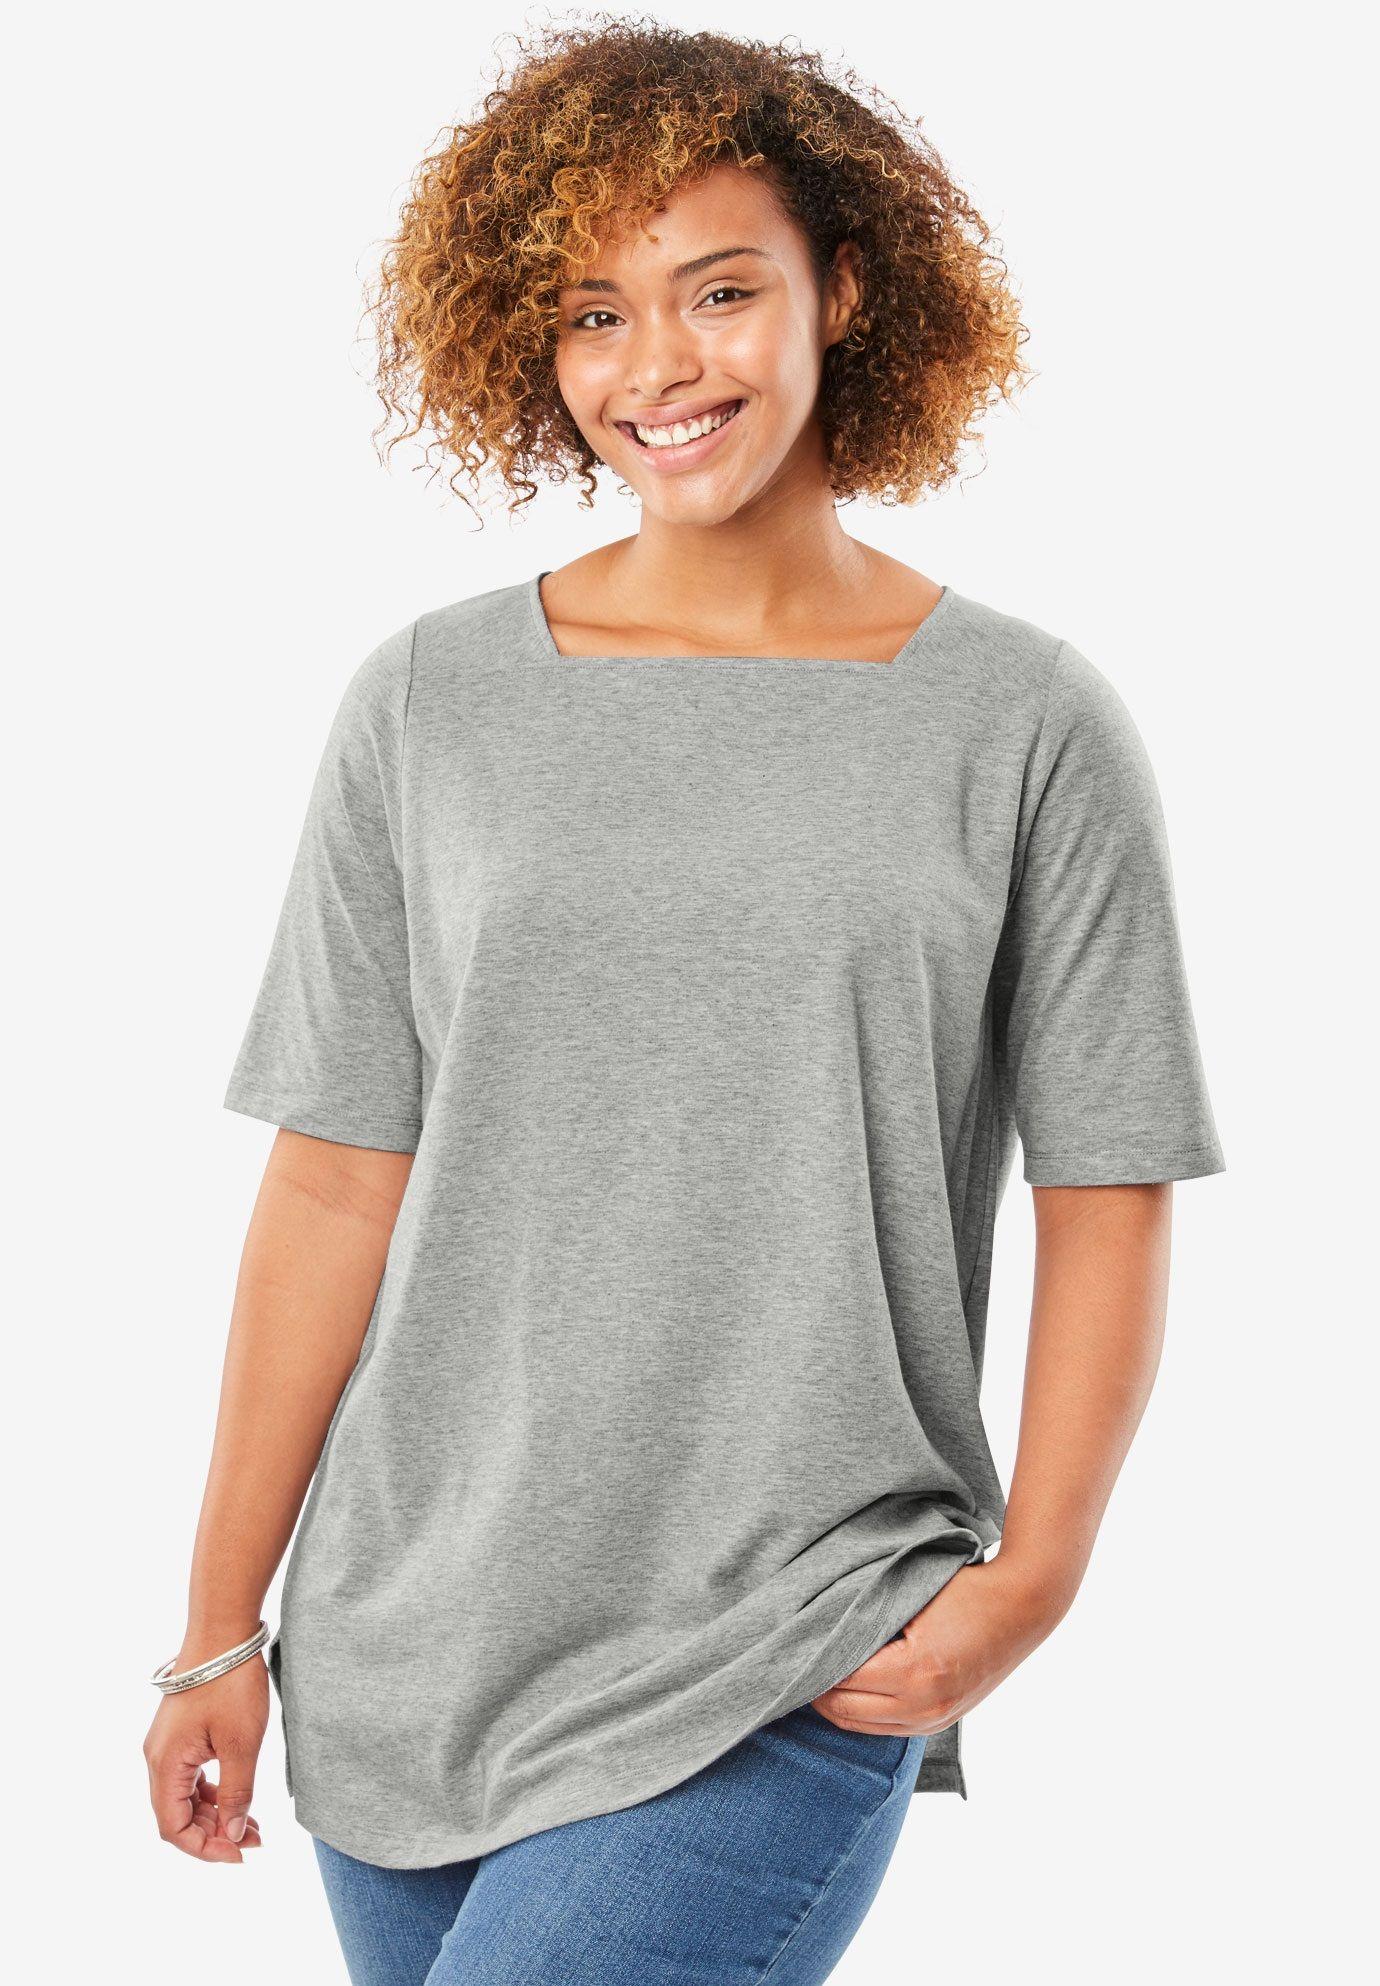 a2e88eb66ffd8 Perfect square neck tee shirt